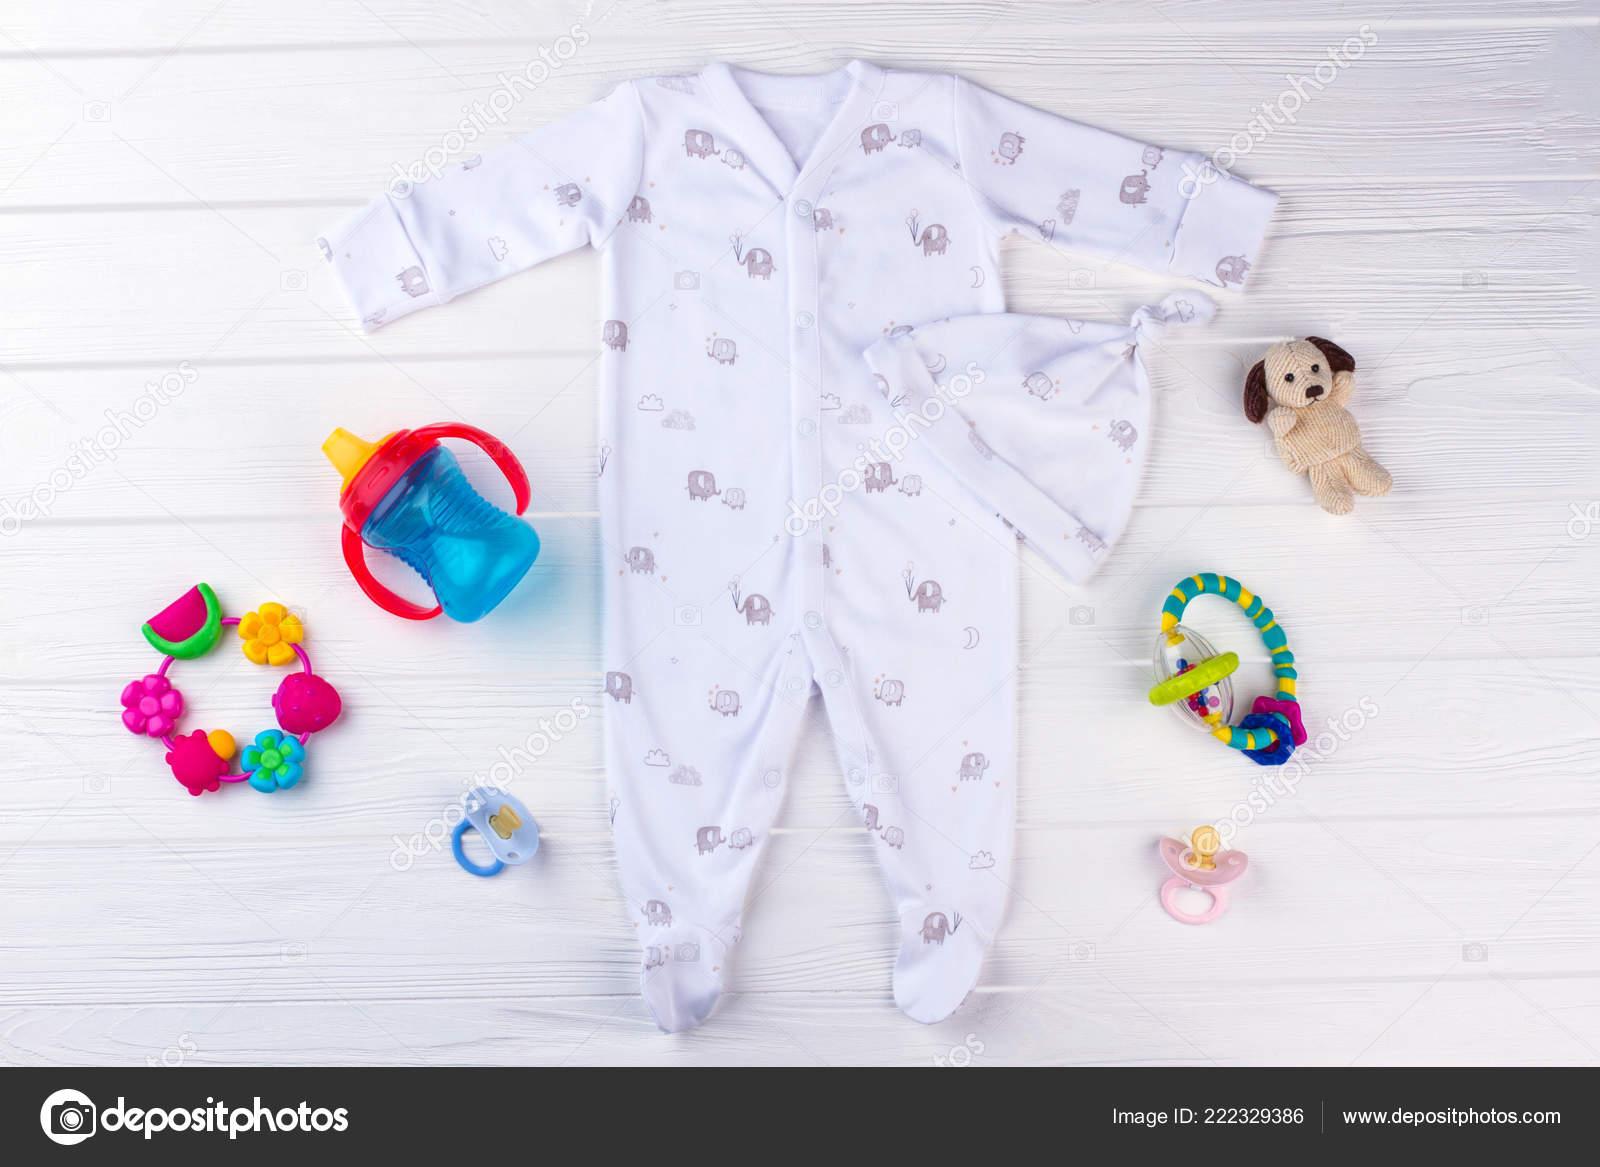 f7268aead42 Σετ Βρεφικά Ρούχα Και Είδη Ανάγκης Λευκό Μωρό Pajama Κόμπο — Φωτογραφία  Αρχείου